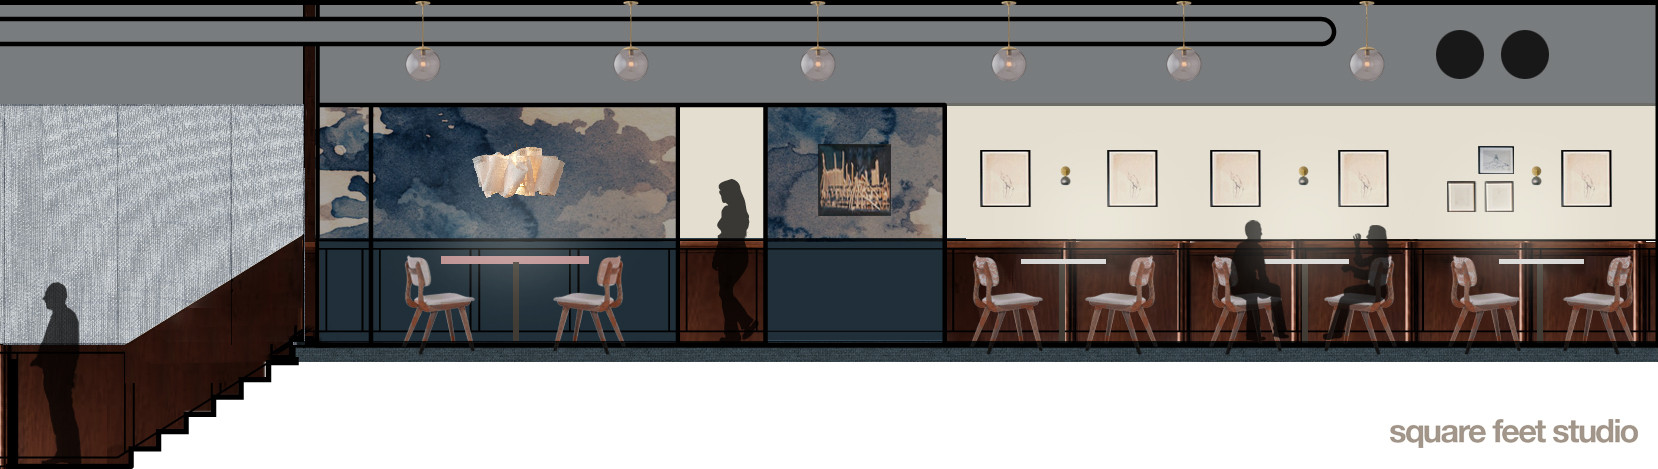 Haymaker Mezzanine rendering.jpg